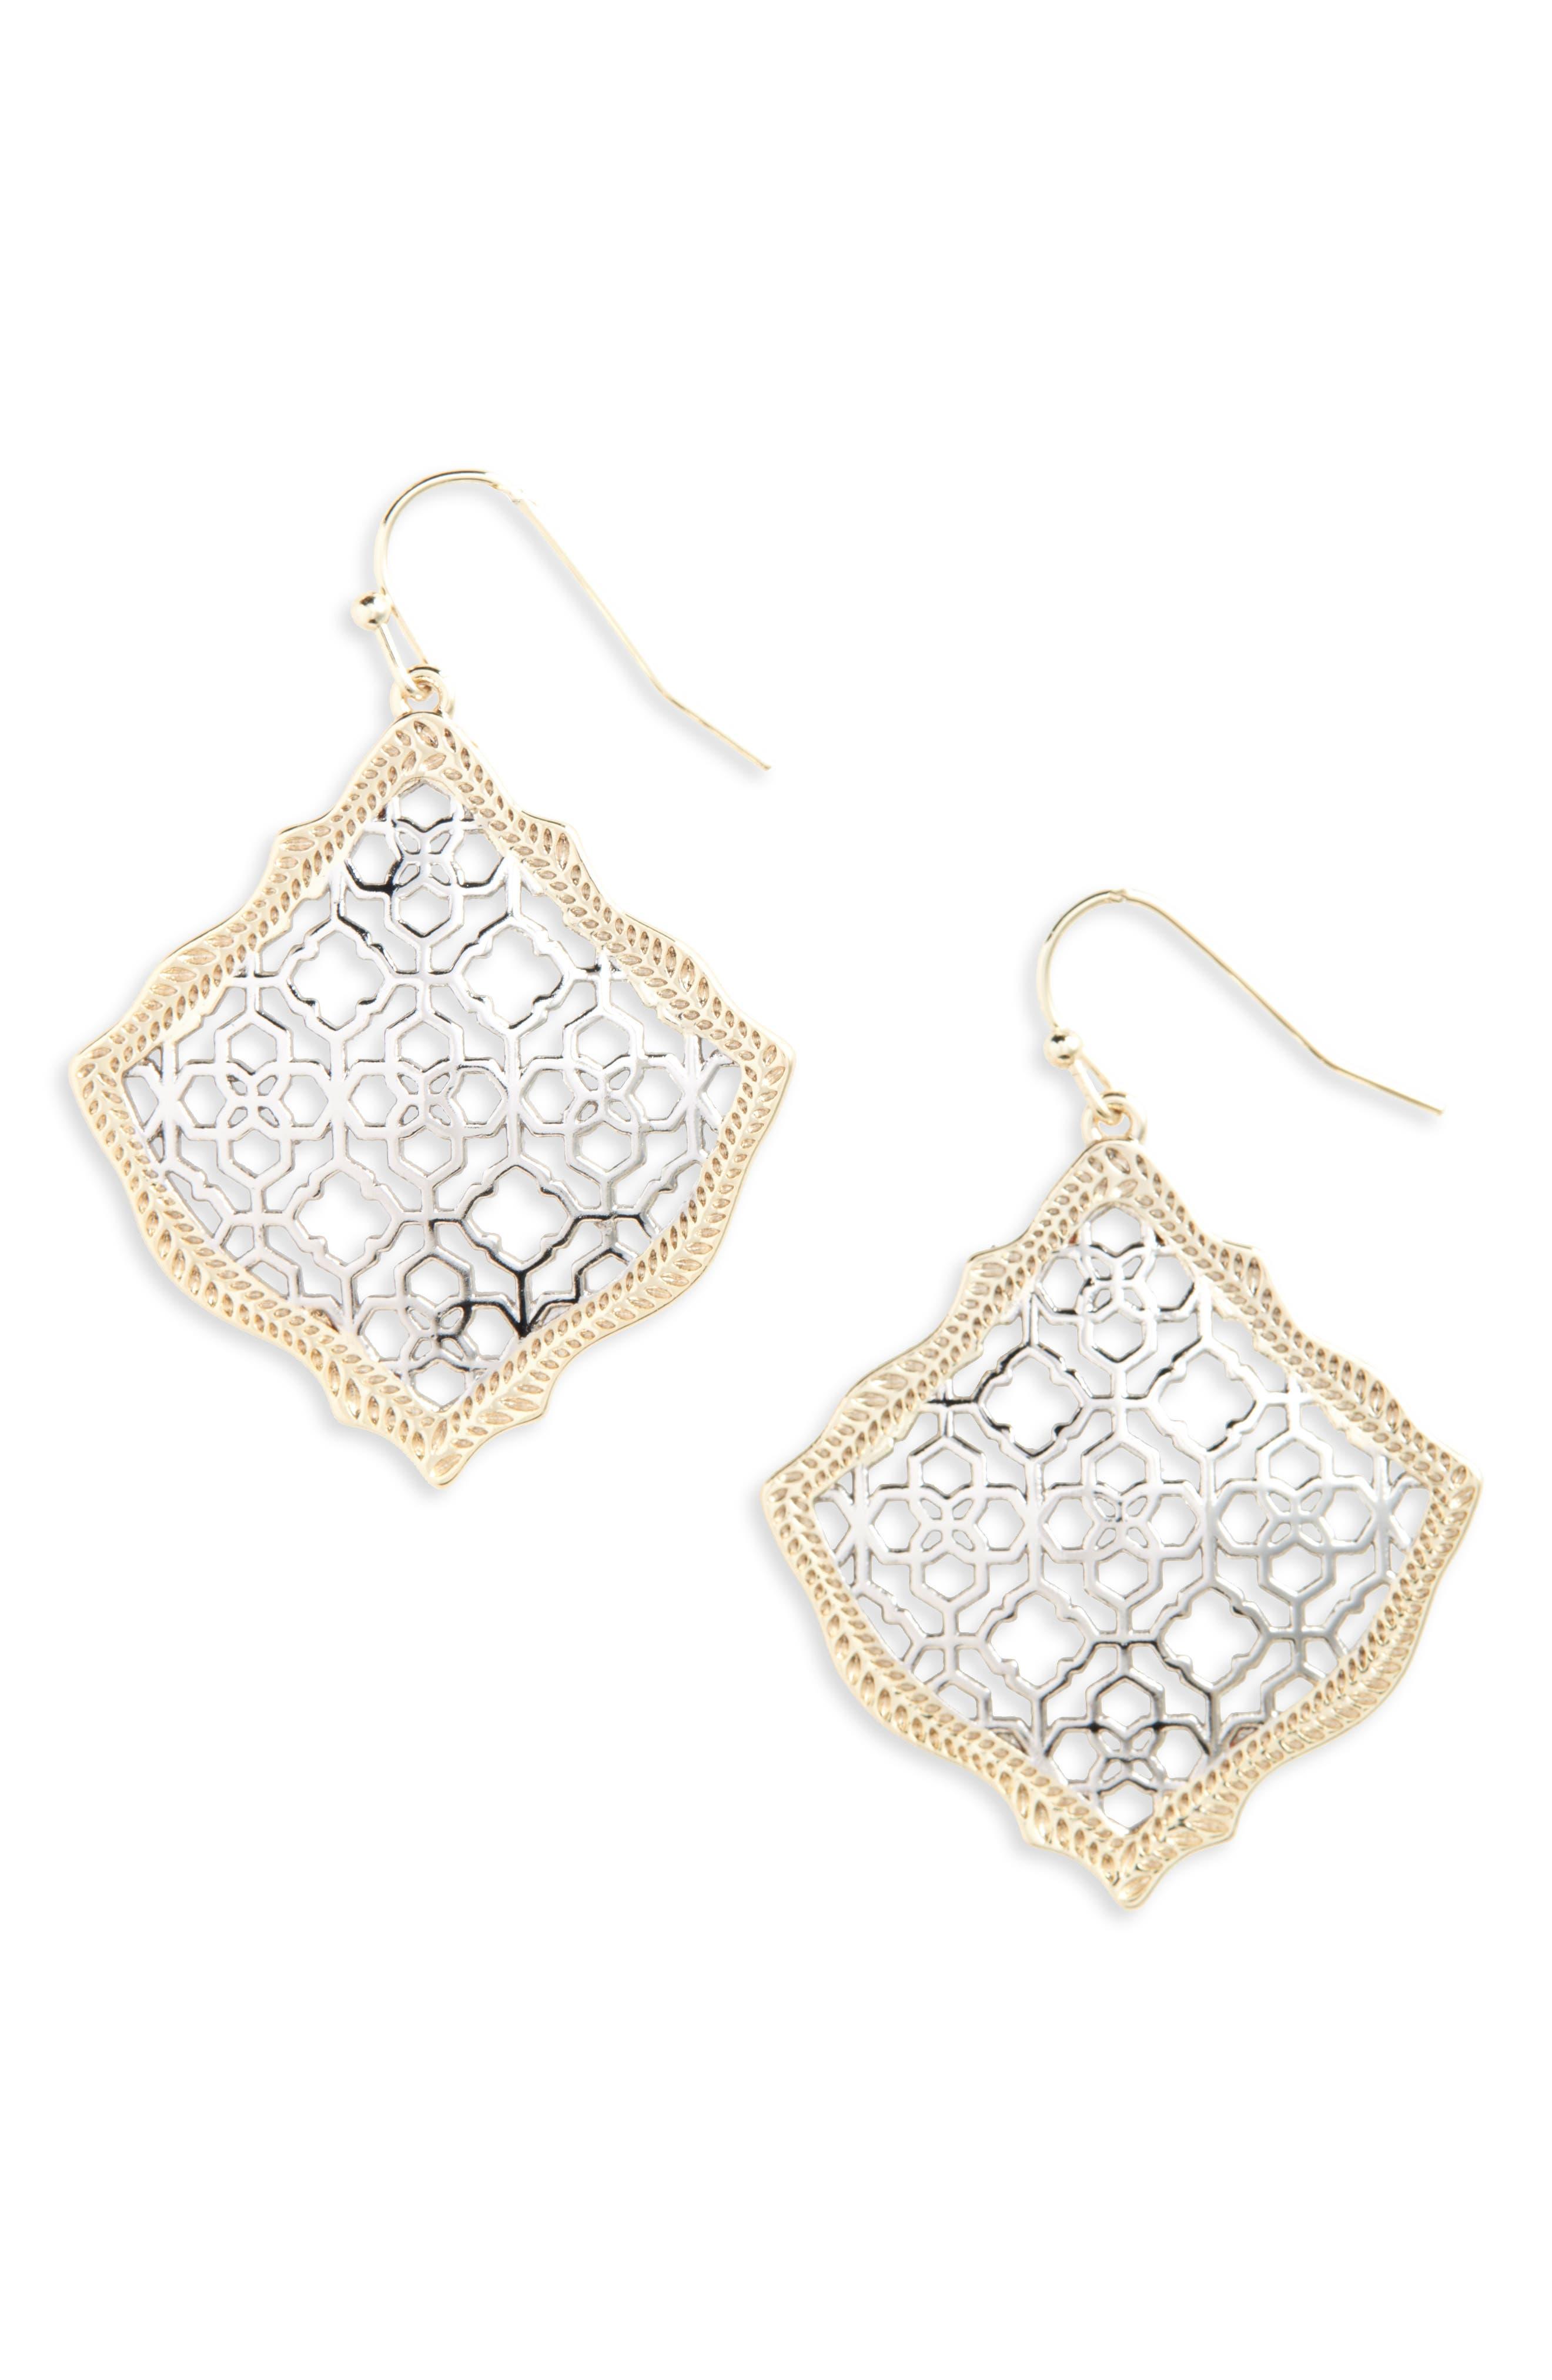 KENDRA SCOTT Kirsten Drop Earrings, Main, color, SILVER FILIGREE/ GOLD